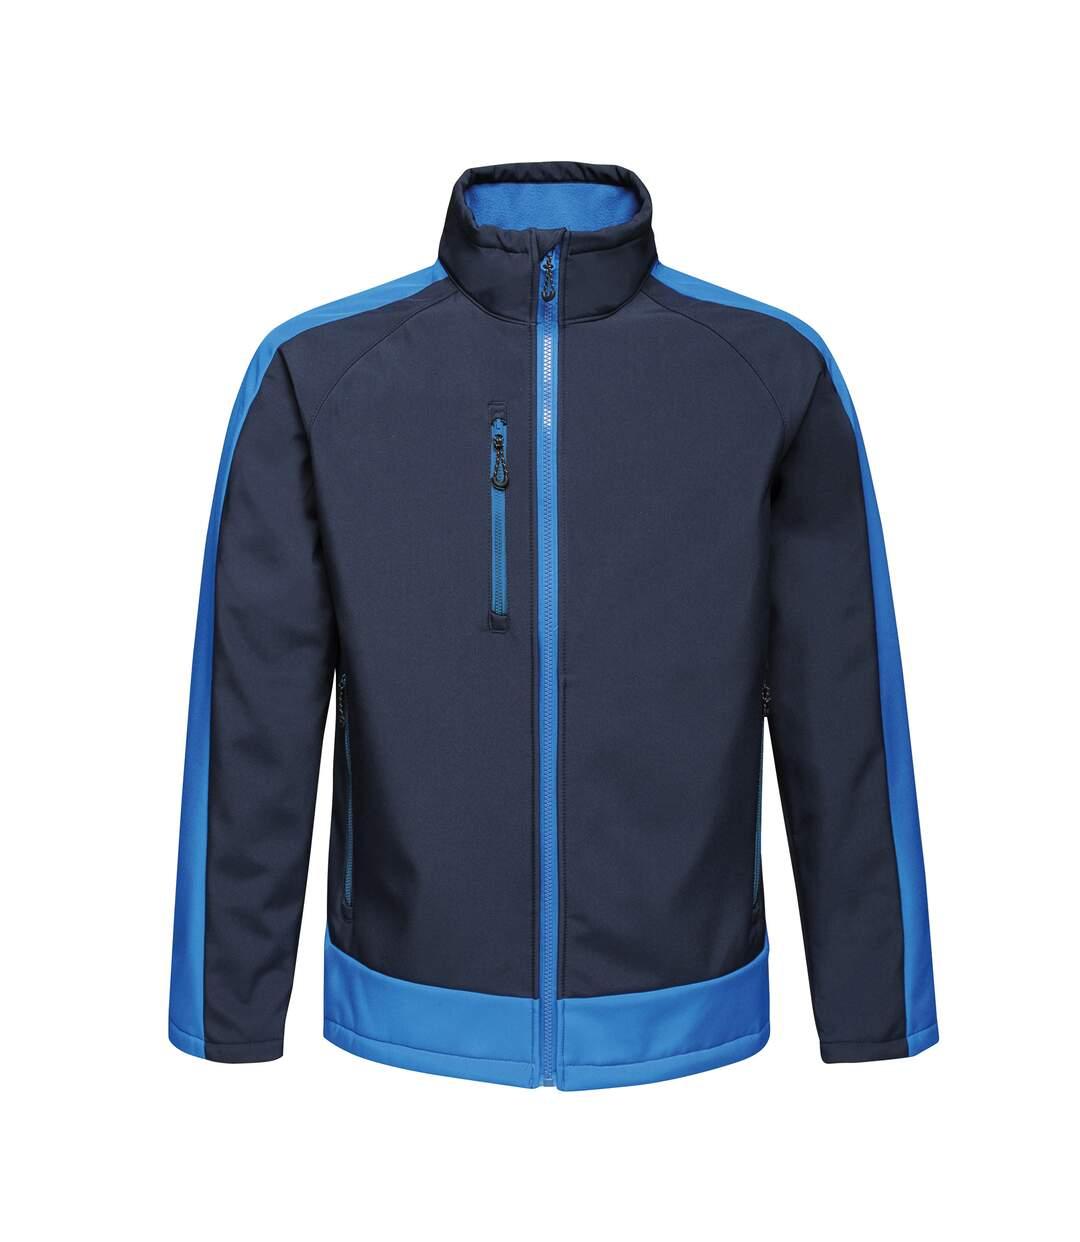 Regatta Contrast Mens 3-Layer Printable Softshell Jacket (Navy/New Royal) - UTRW6355